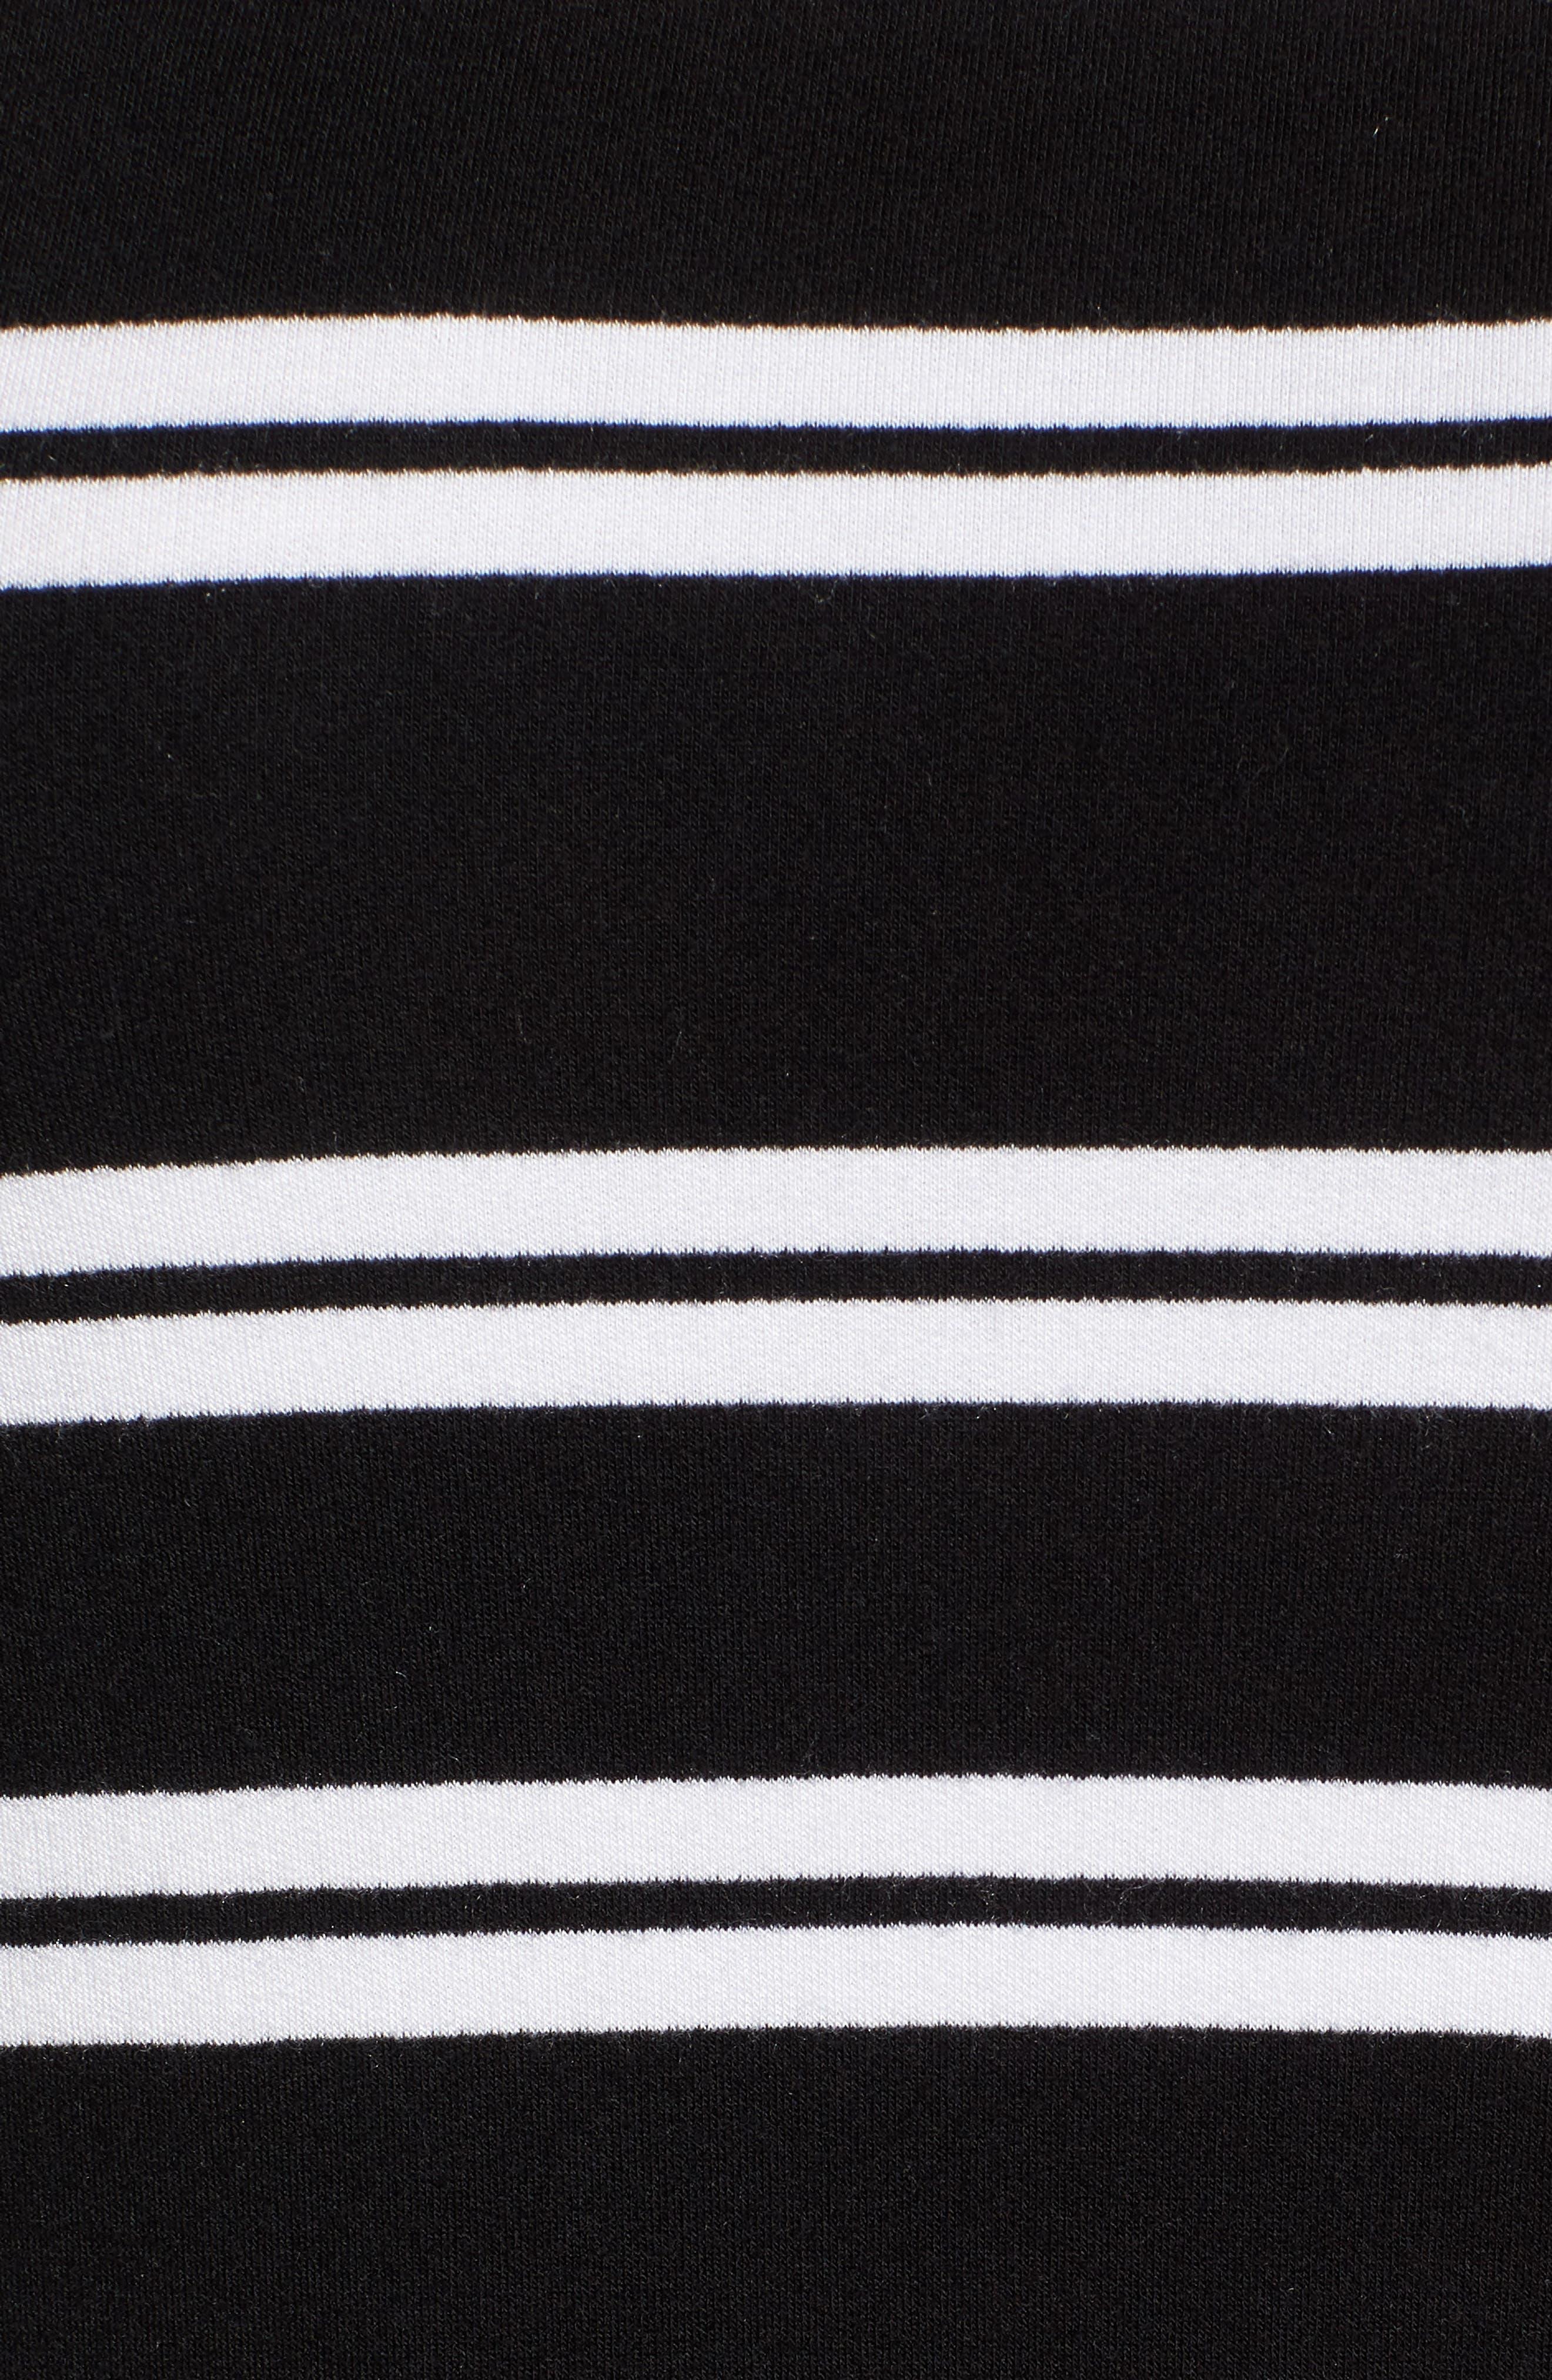 Sleeveless Stretch Knit Stripe Dress,                             Alternate thumbnail 6, color,                             Black